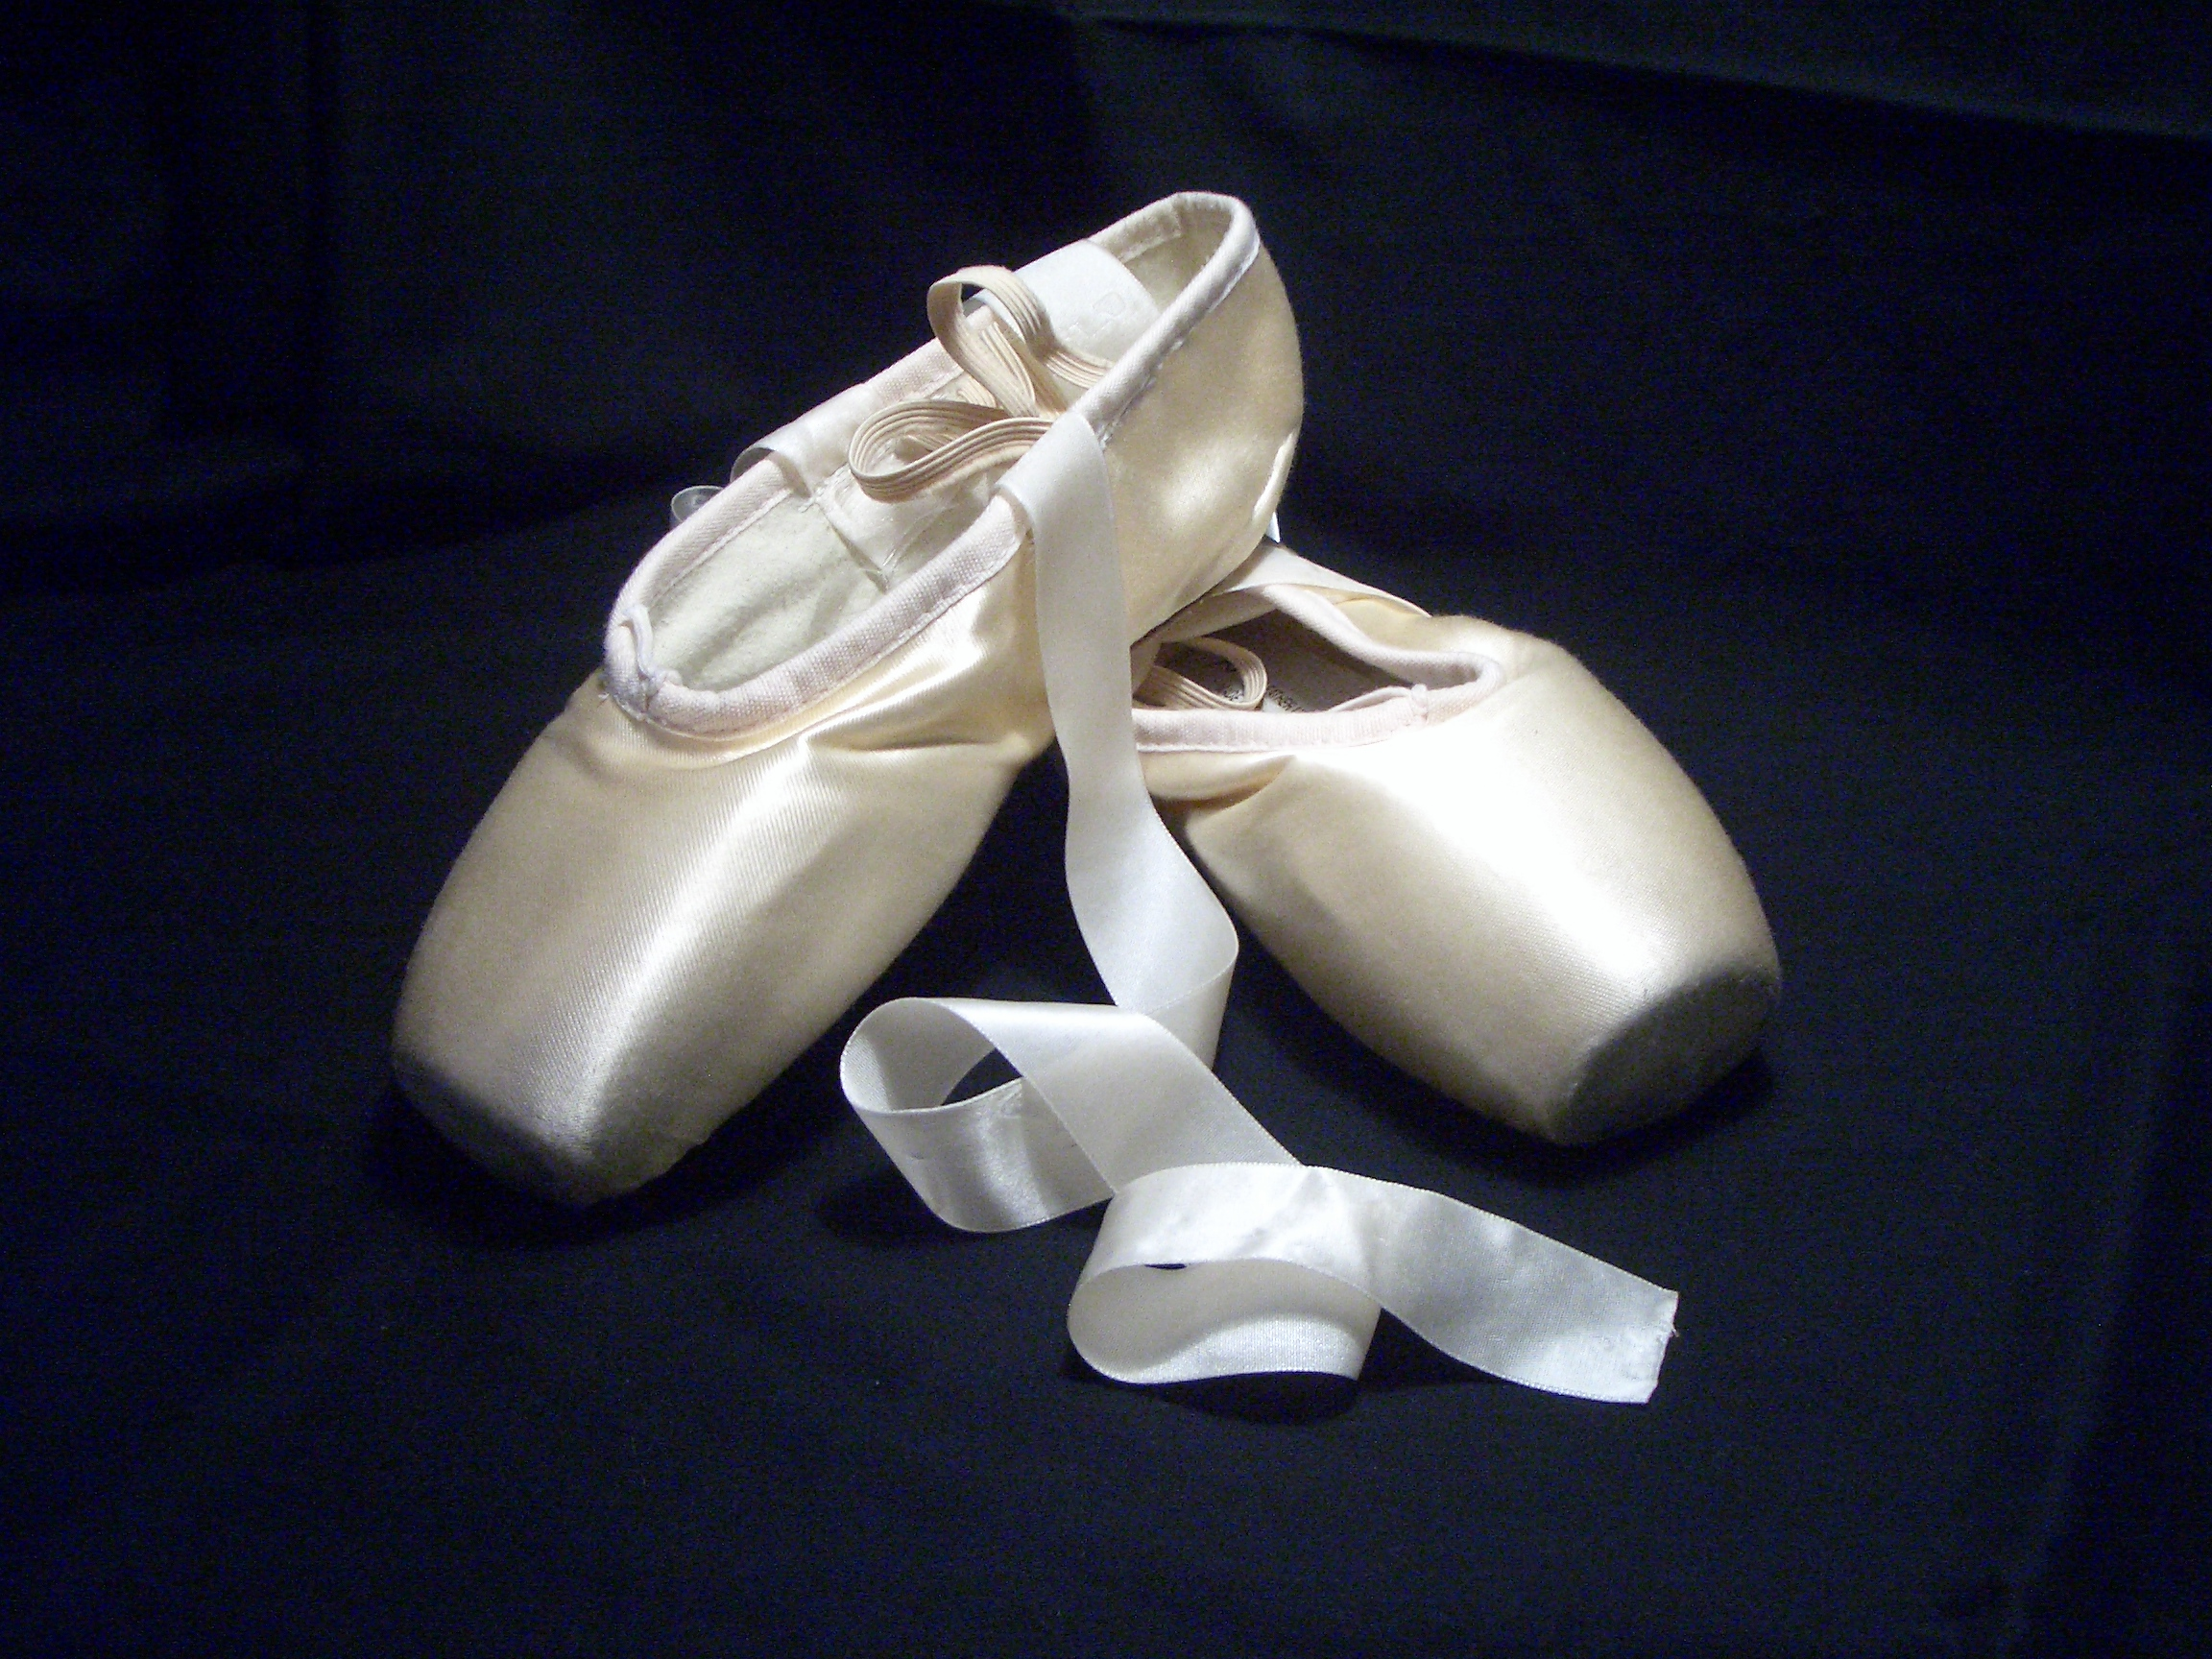 Salsa Dance Shoes in Los Angeles В» Salsa News & Articles